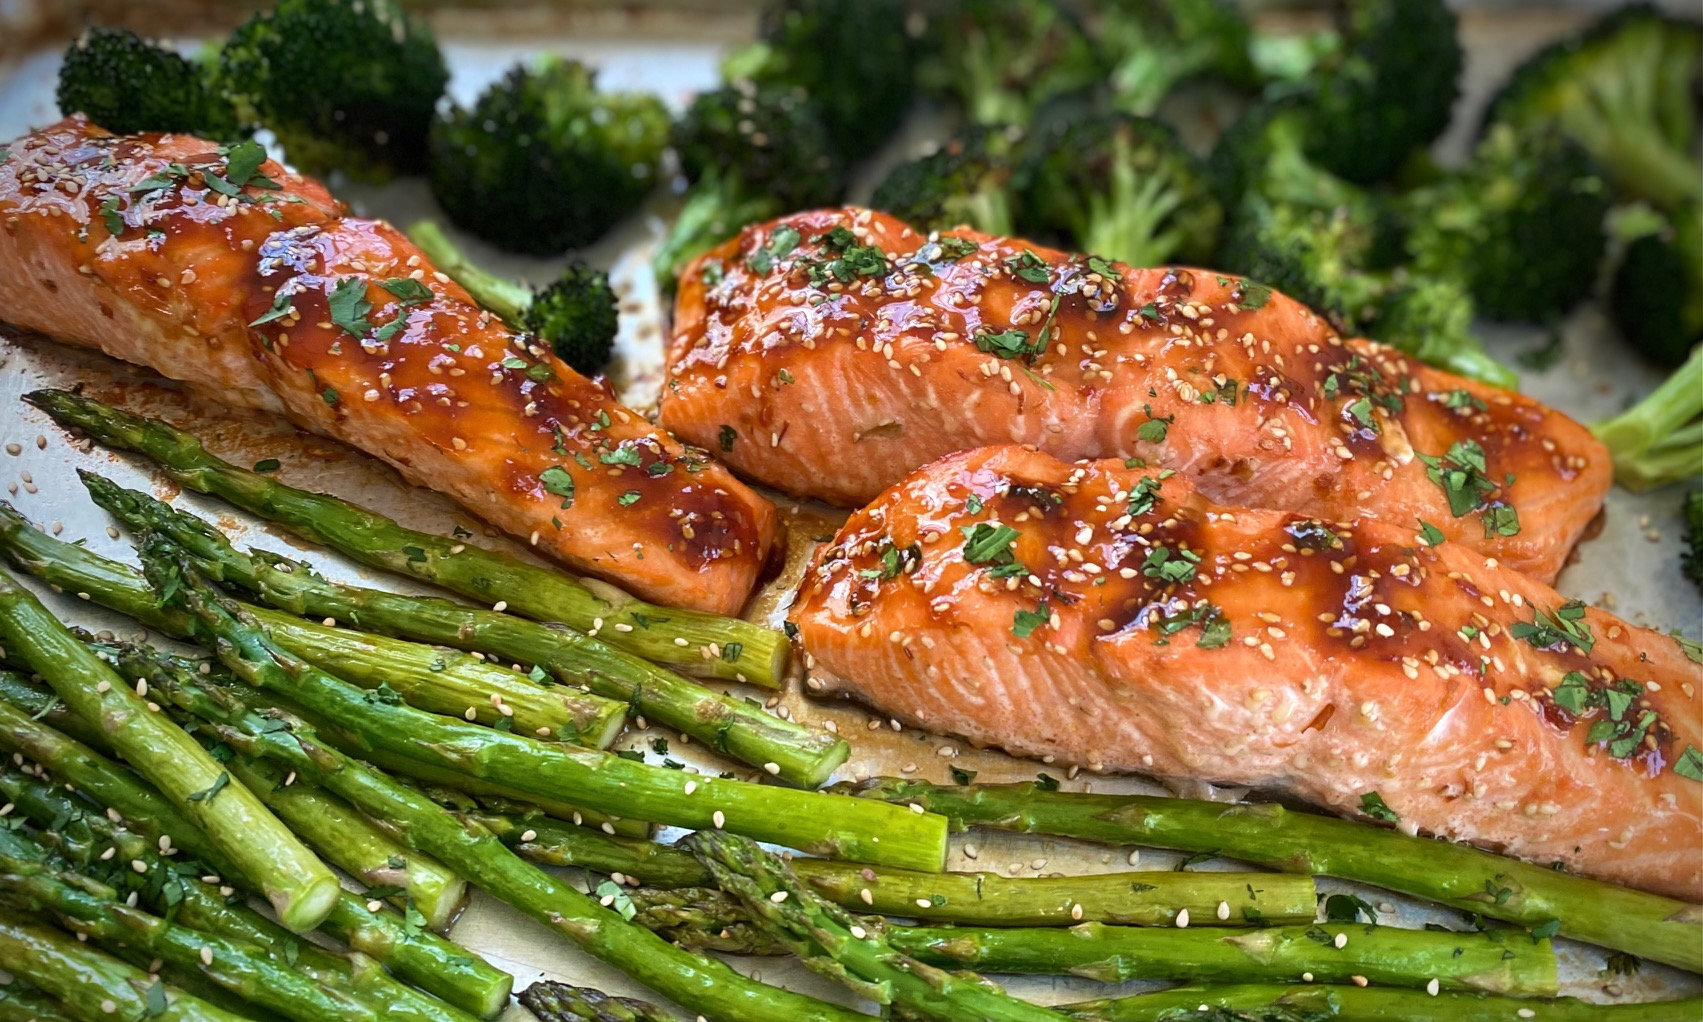 Sheet Pan Salmon with Asparagus